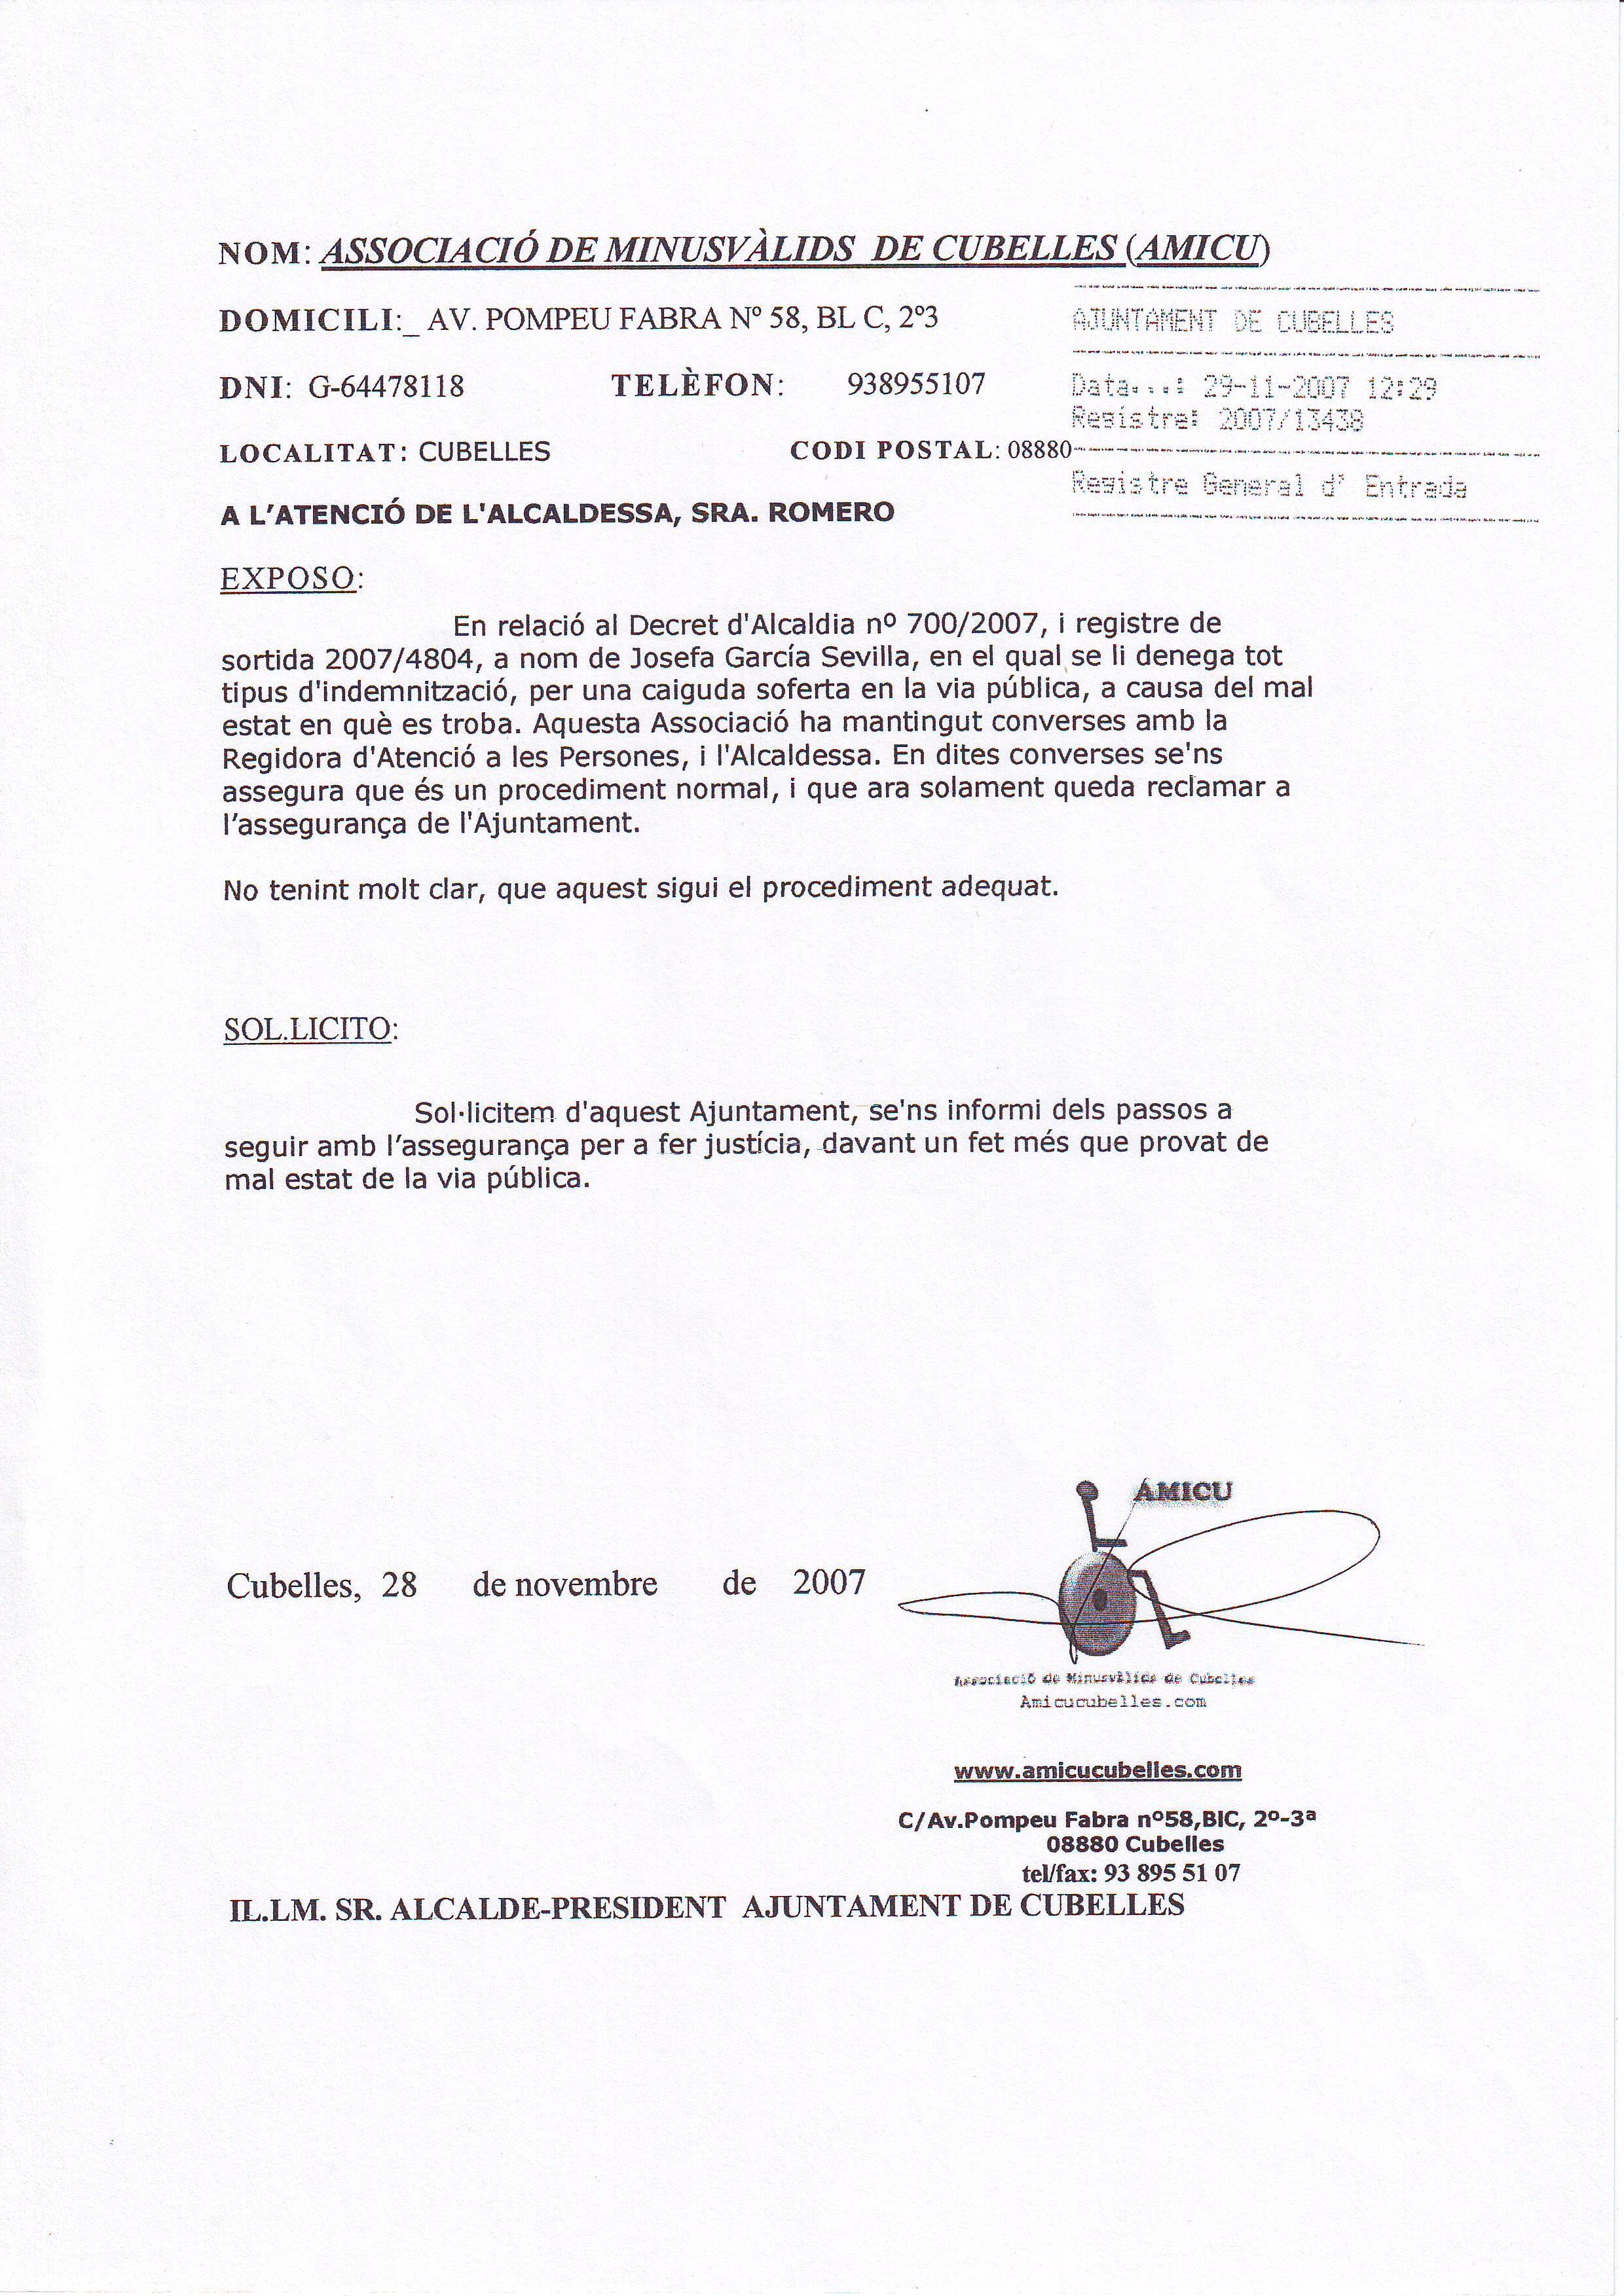 INSTANCIA-DECRETO ALCALDIA-JOSEFA GARCIA-CAIDA 24 JUNIO 2007- 29-11-2007